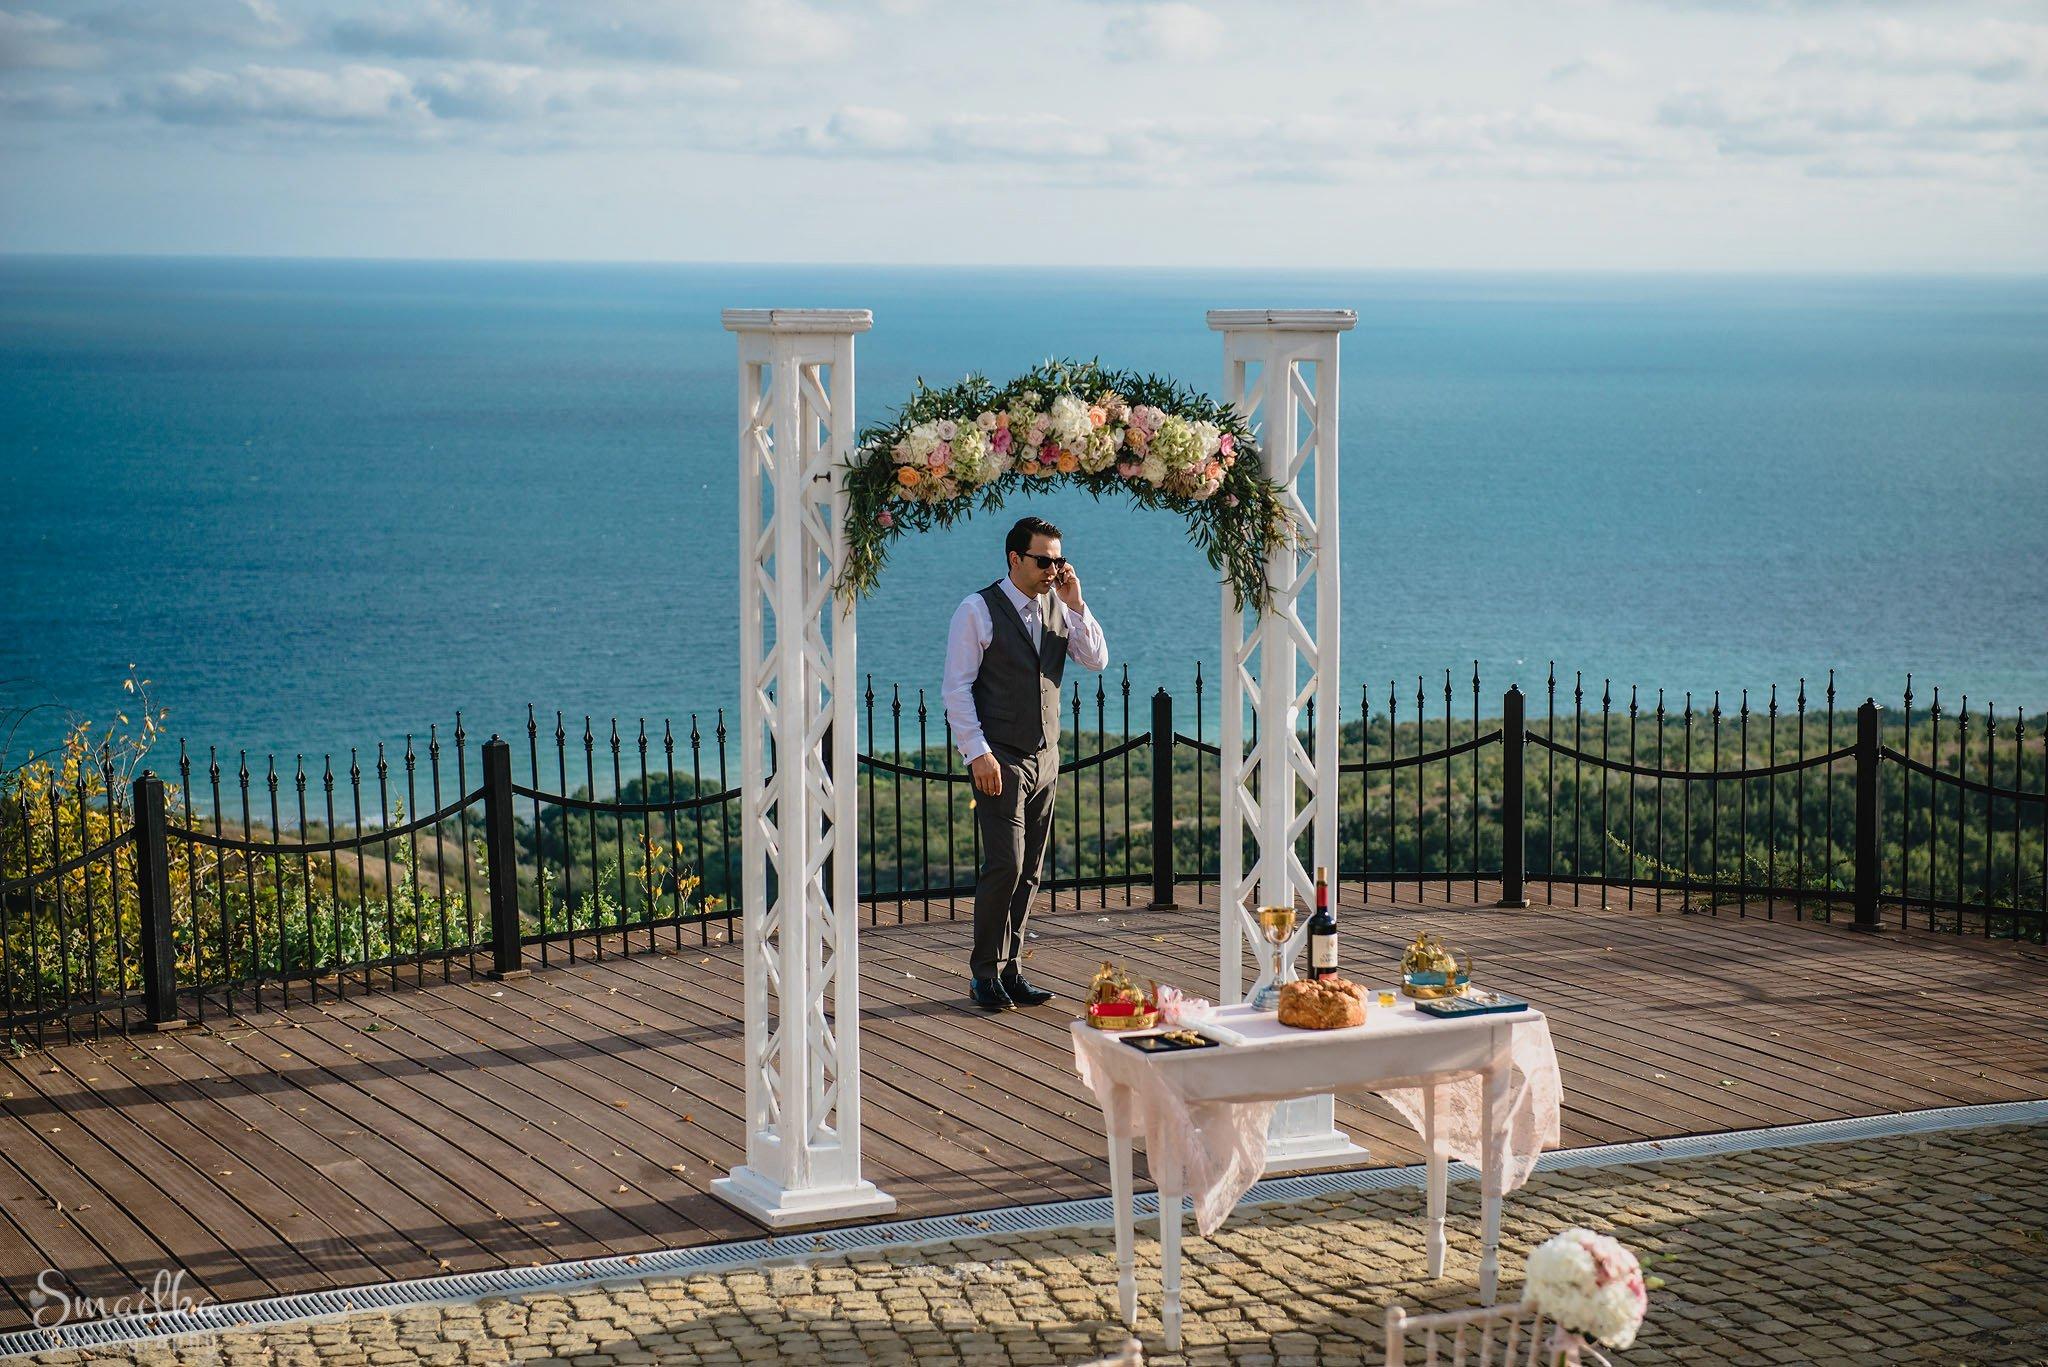 Groom at the wedding arc at Black Sea Rama